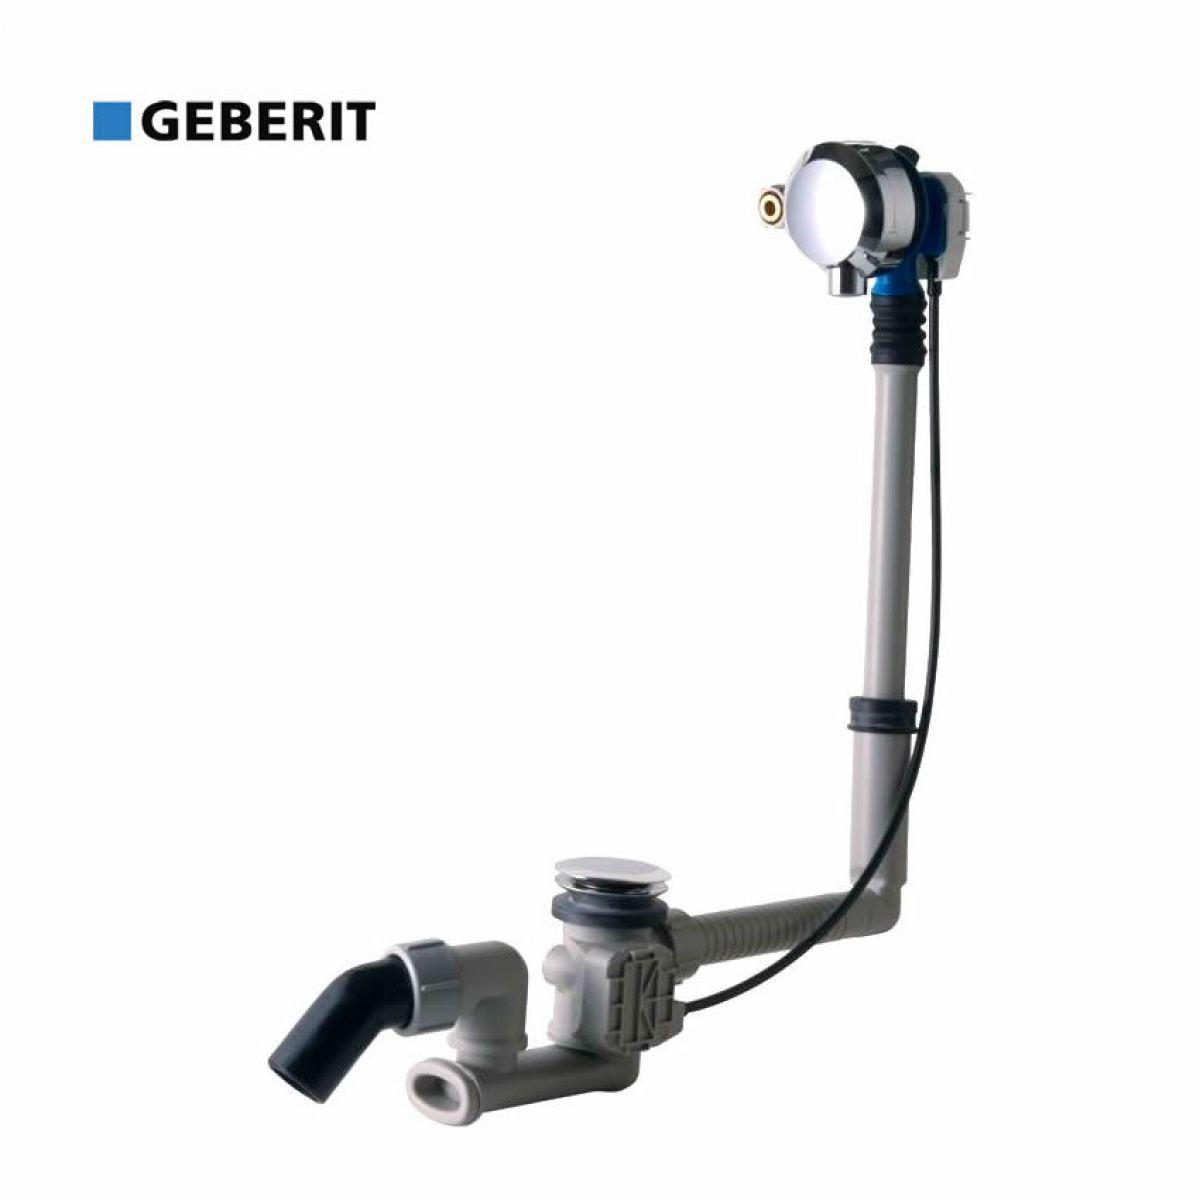 Geberit Overflow Bath Filler With Turn Control Pop Up Waste ...